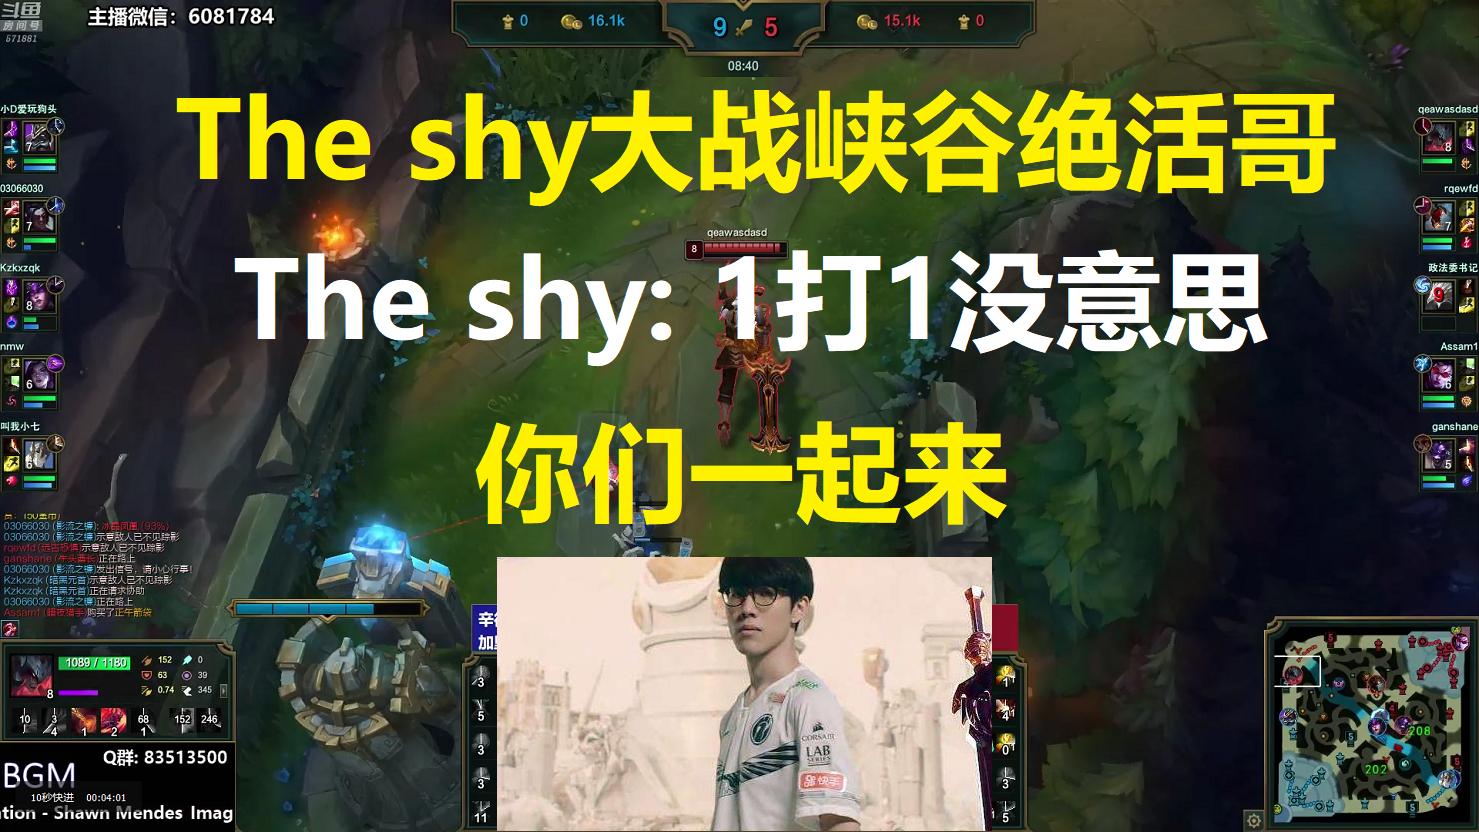 The shy大战峡谷绝活哥,The shy: 1打1没意思,你们一起来!